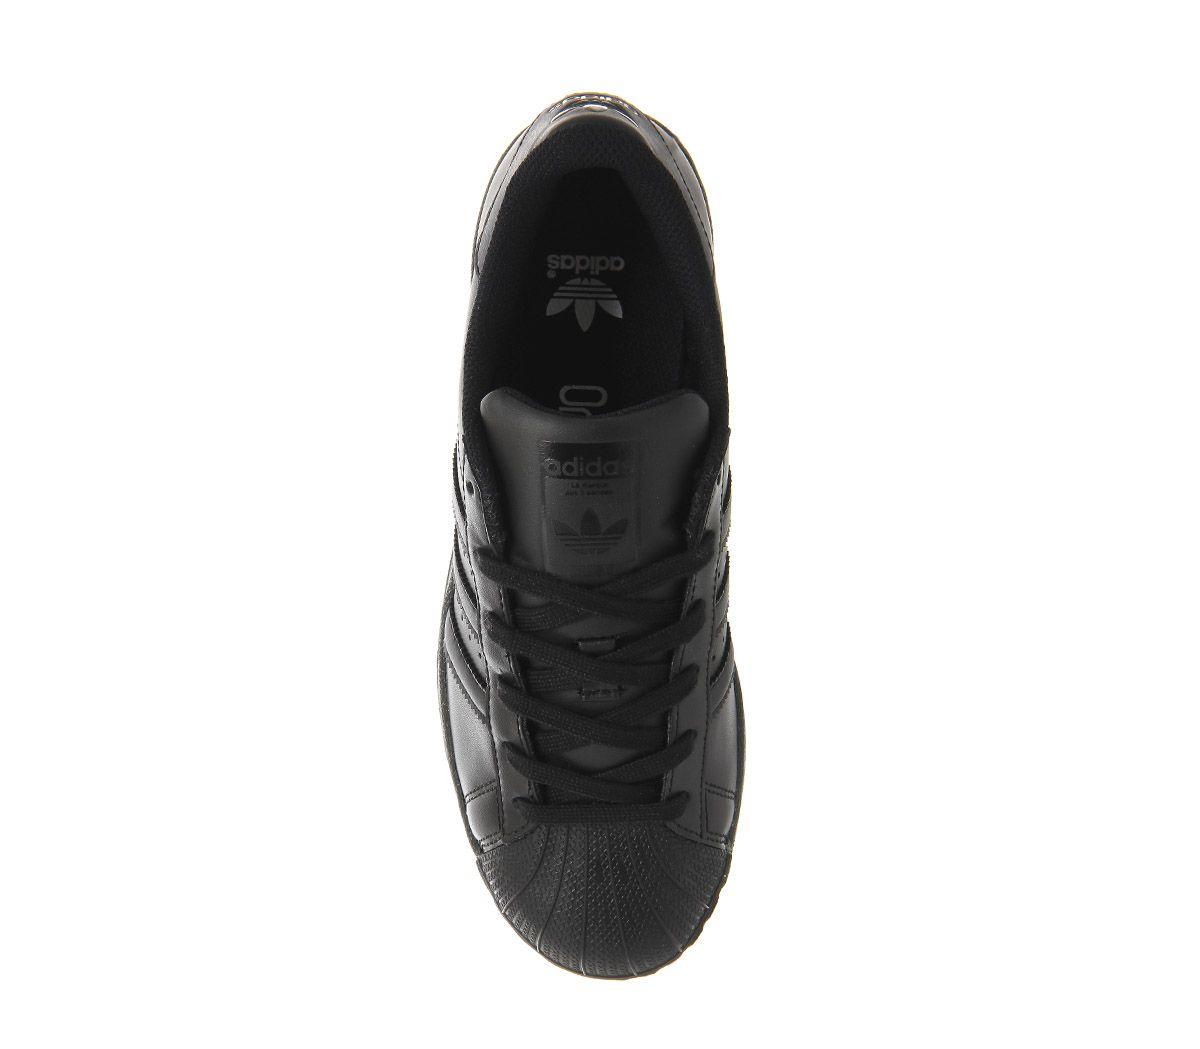 7330453c4e19e Womens Adidas Superstar Trainers Black Mono Trainers Shoes   eBay